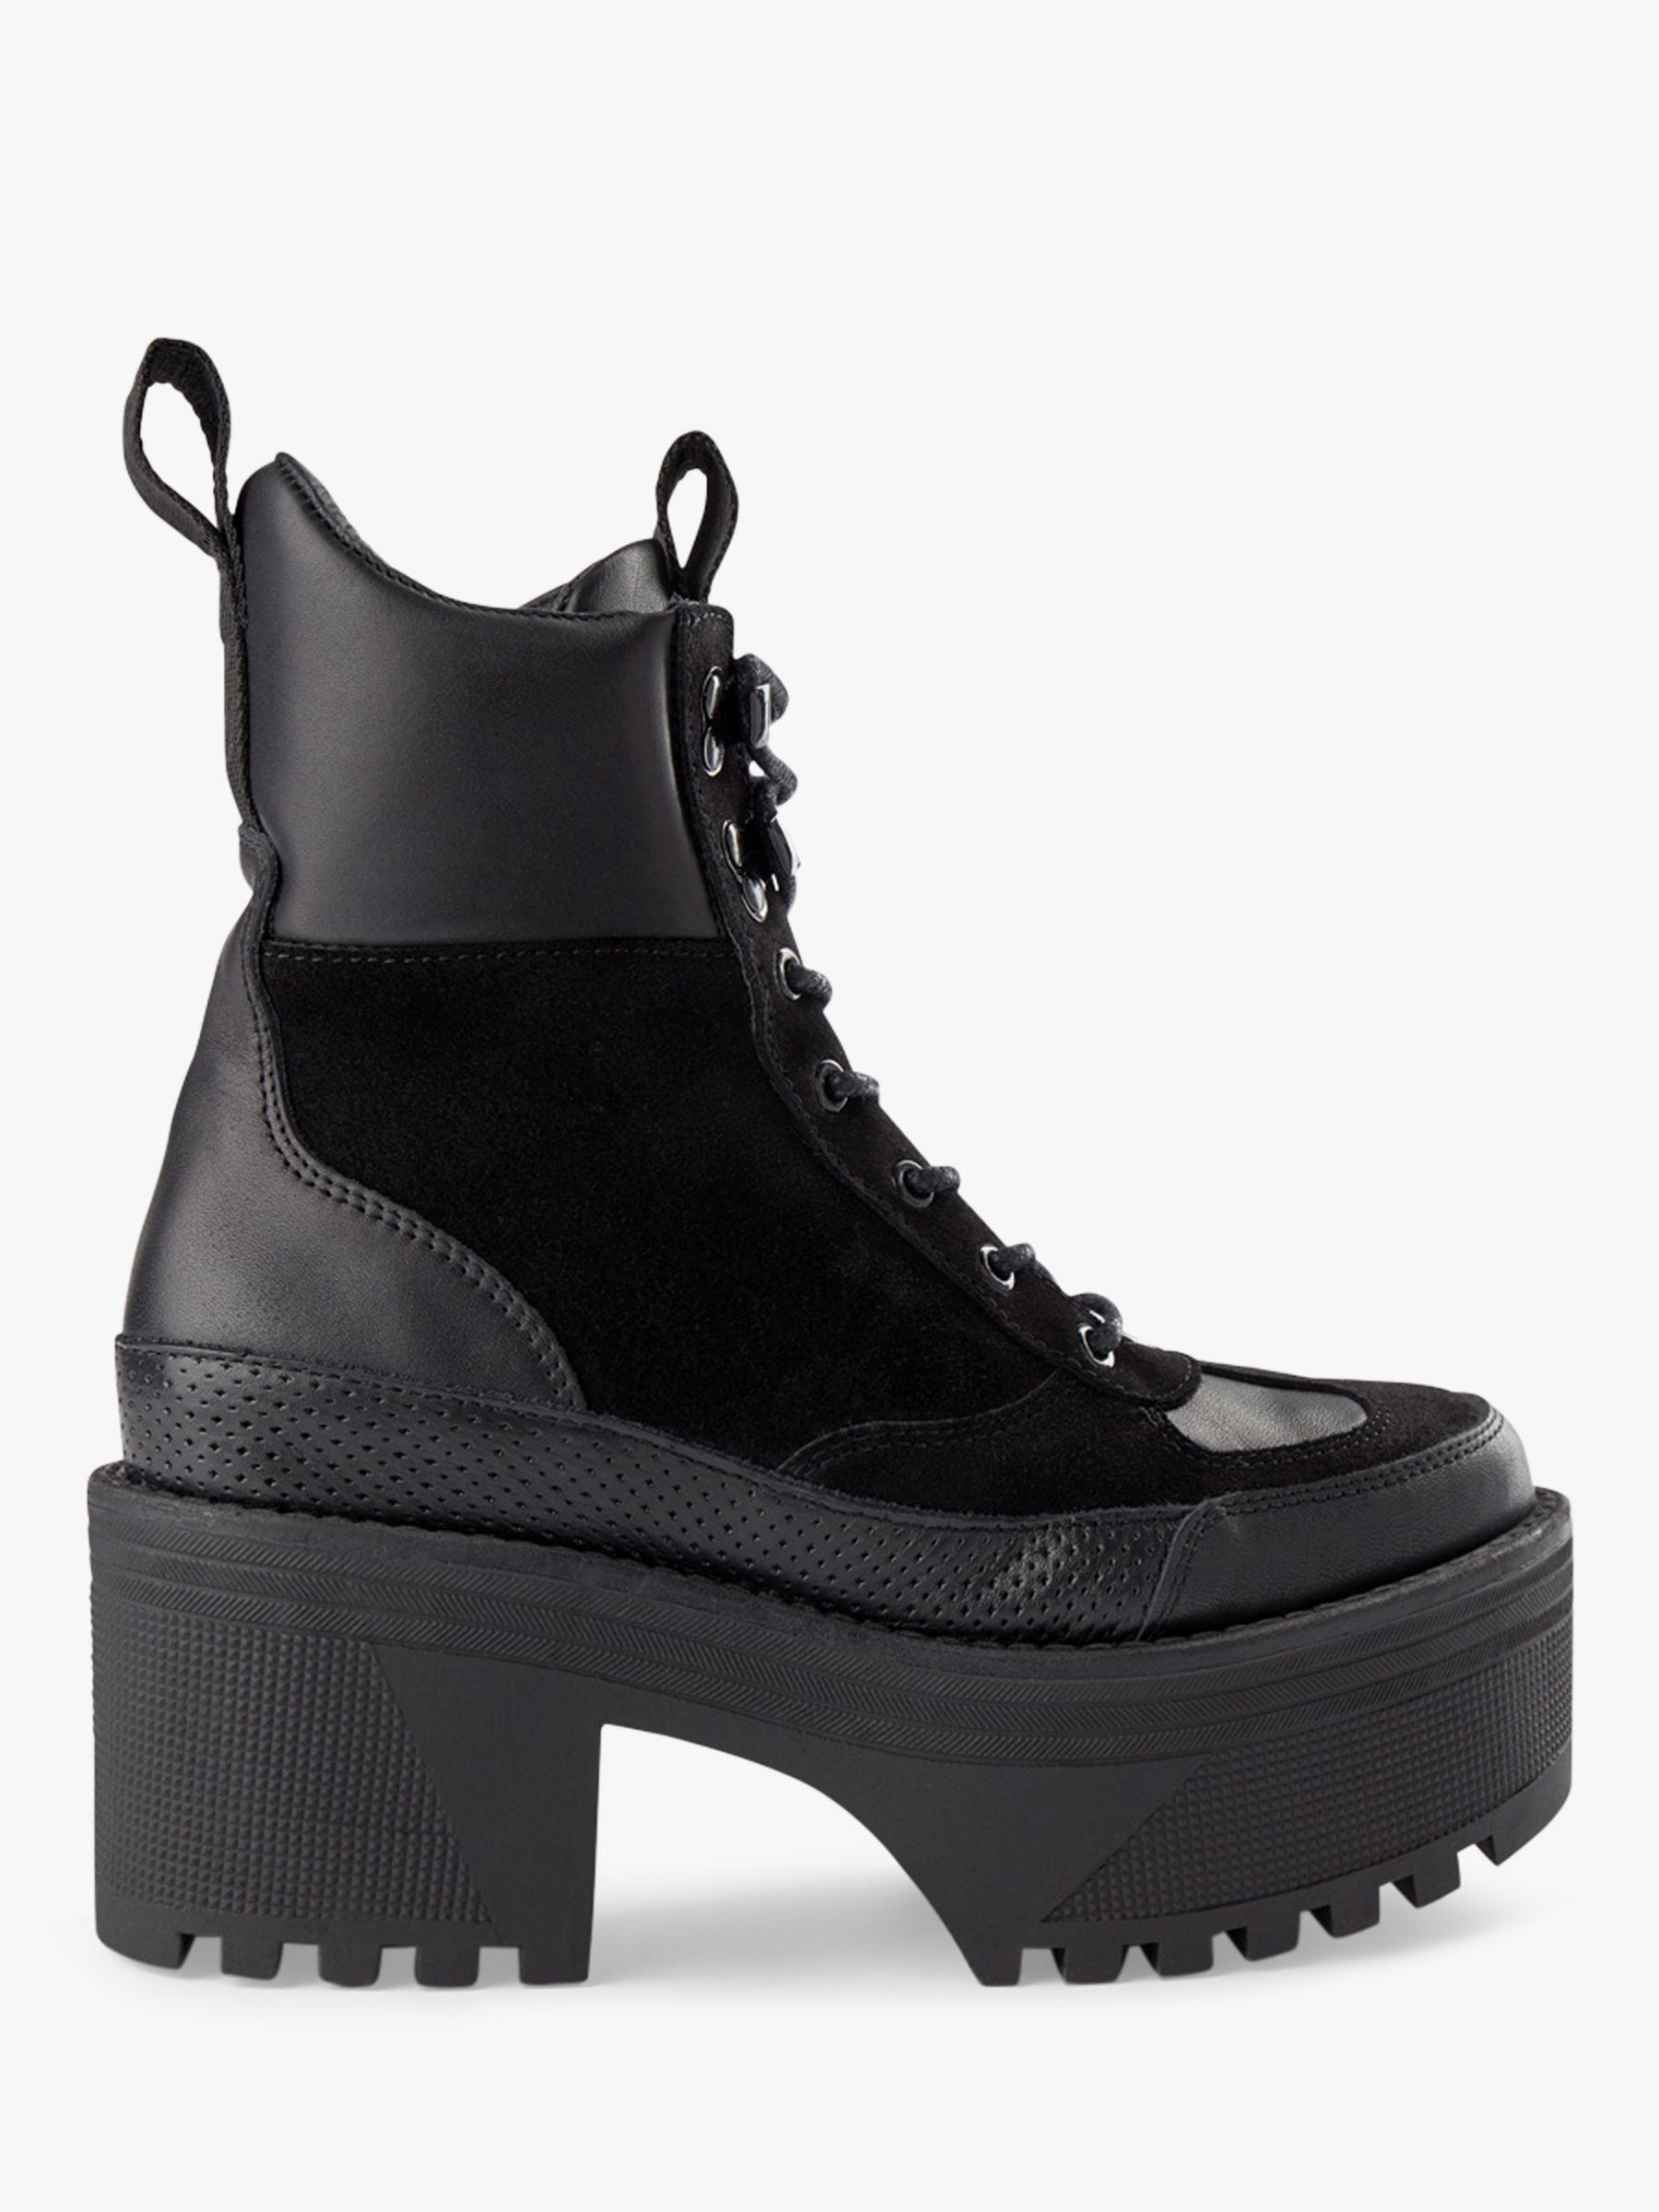 Shoe the Bear SHOE THE BEAR Celeste Hiker Boots, Black